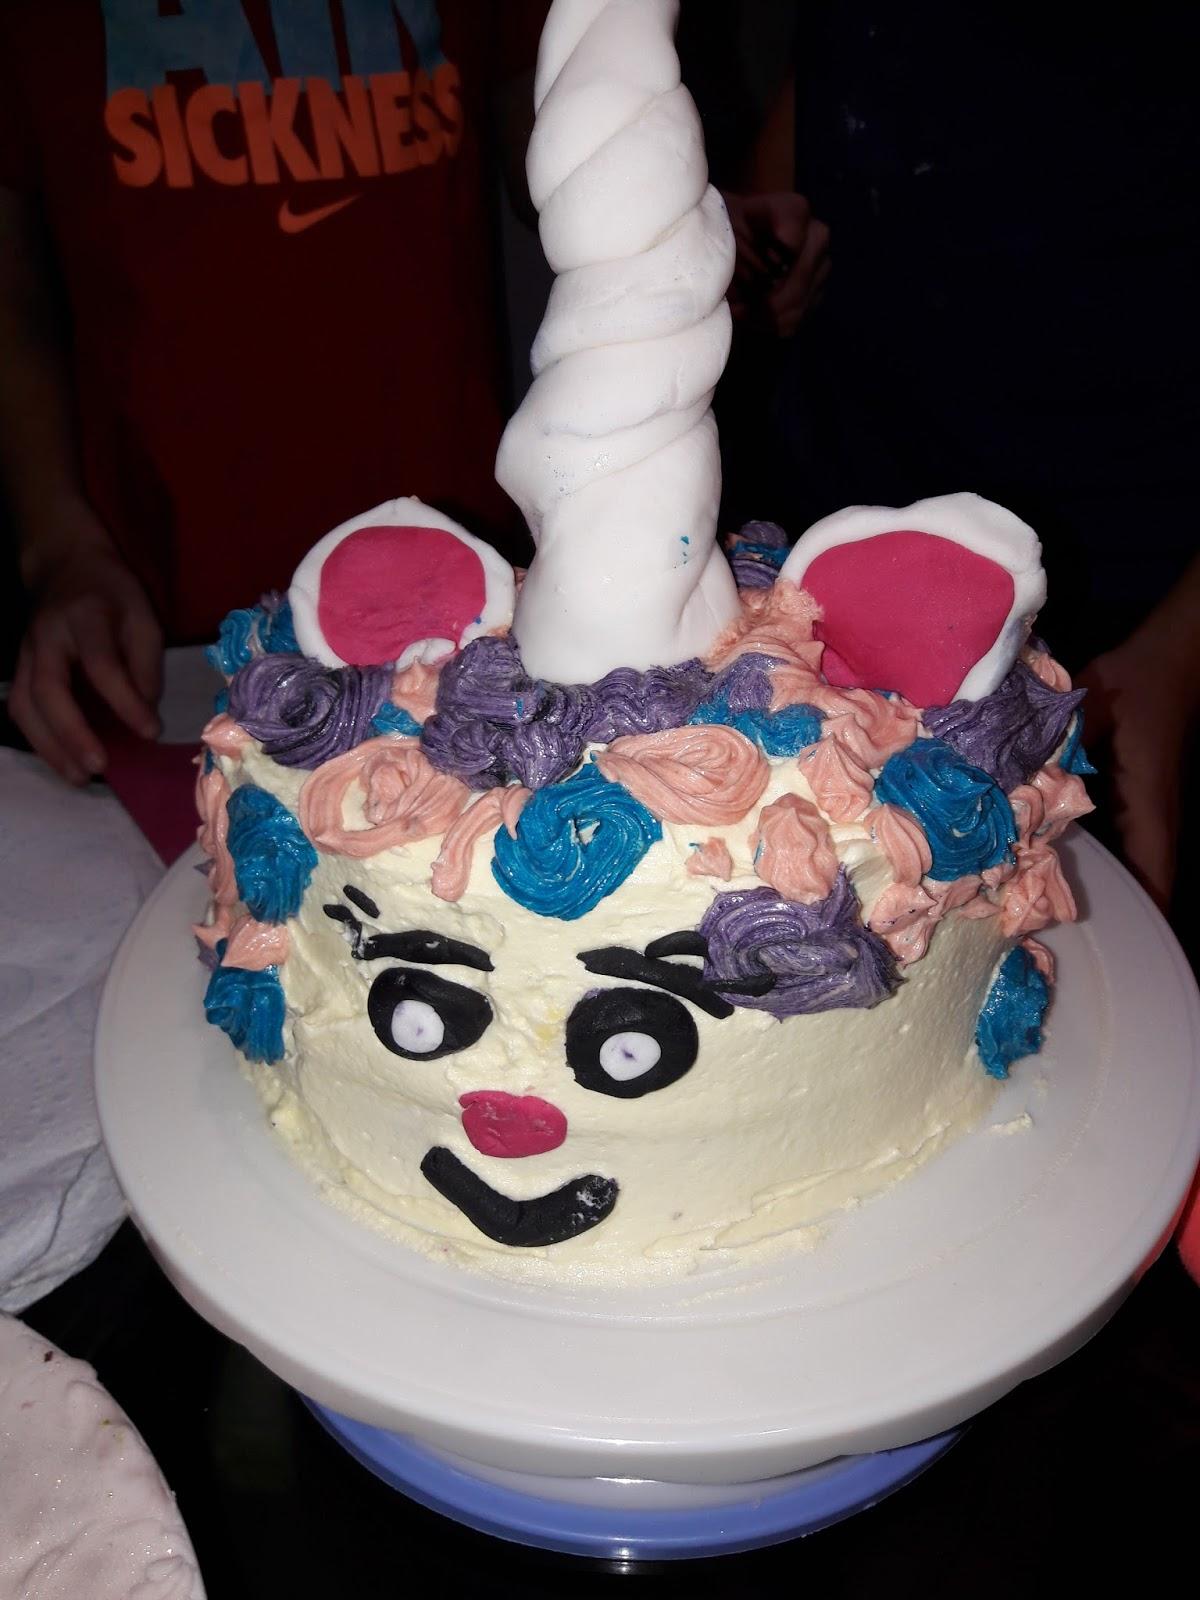 How To Make A Marble Sponge Cake